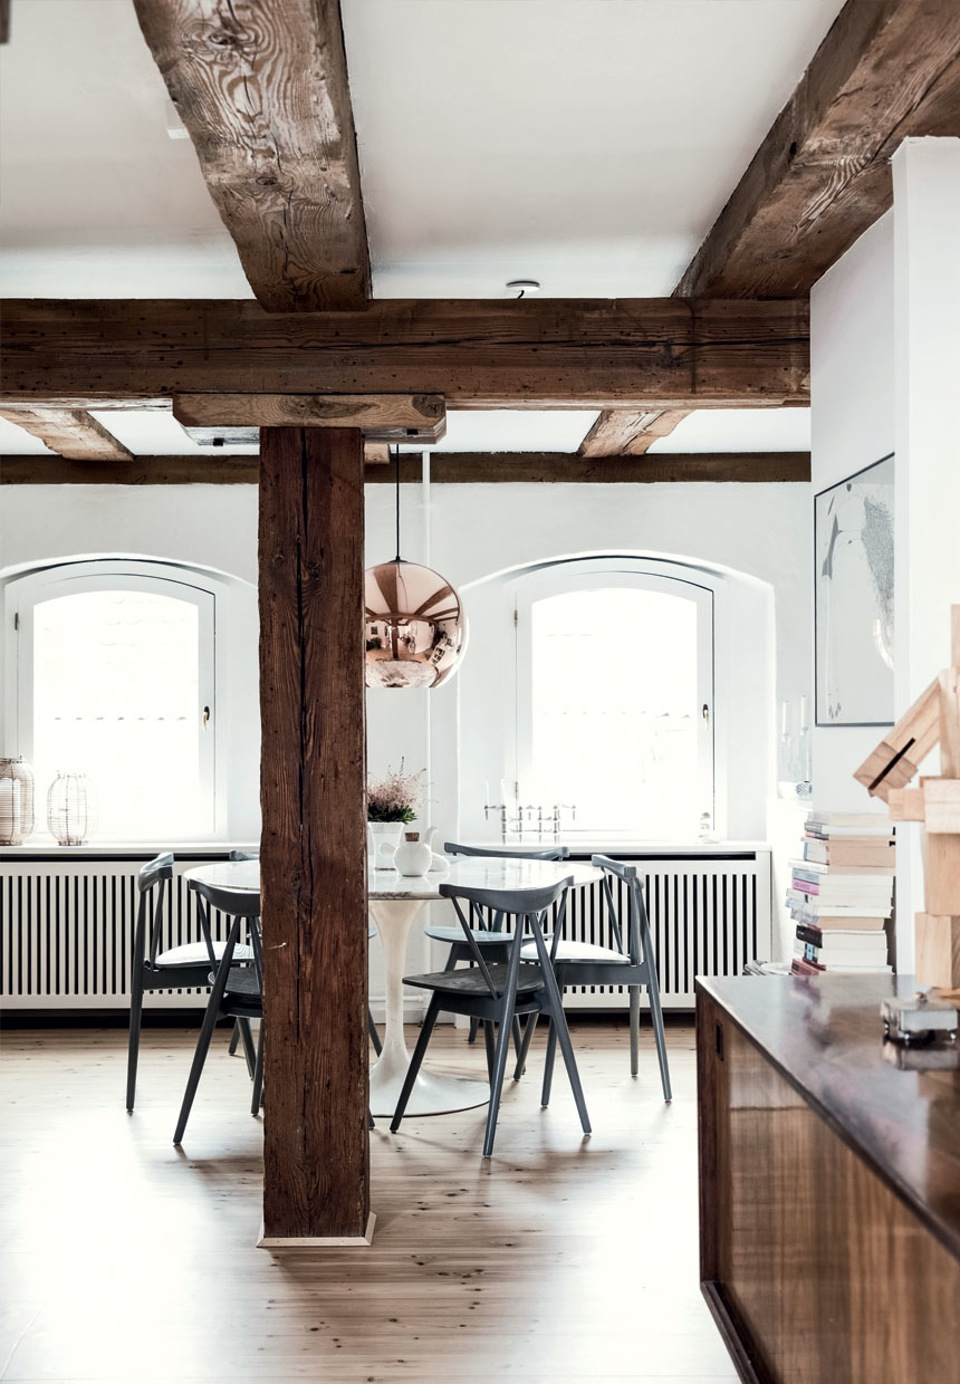 spiseplads-bjaelker-rustik-lejlighed-signe-bloch-ZB0OZka_xQItzIagb7Is2g